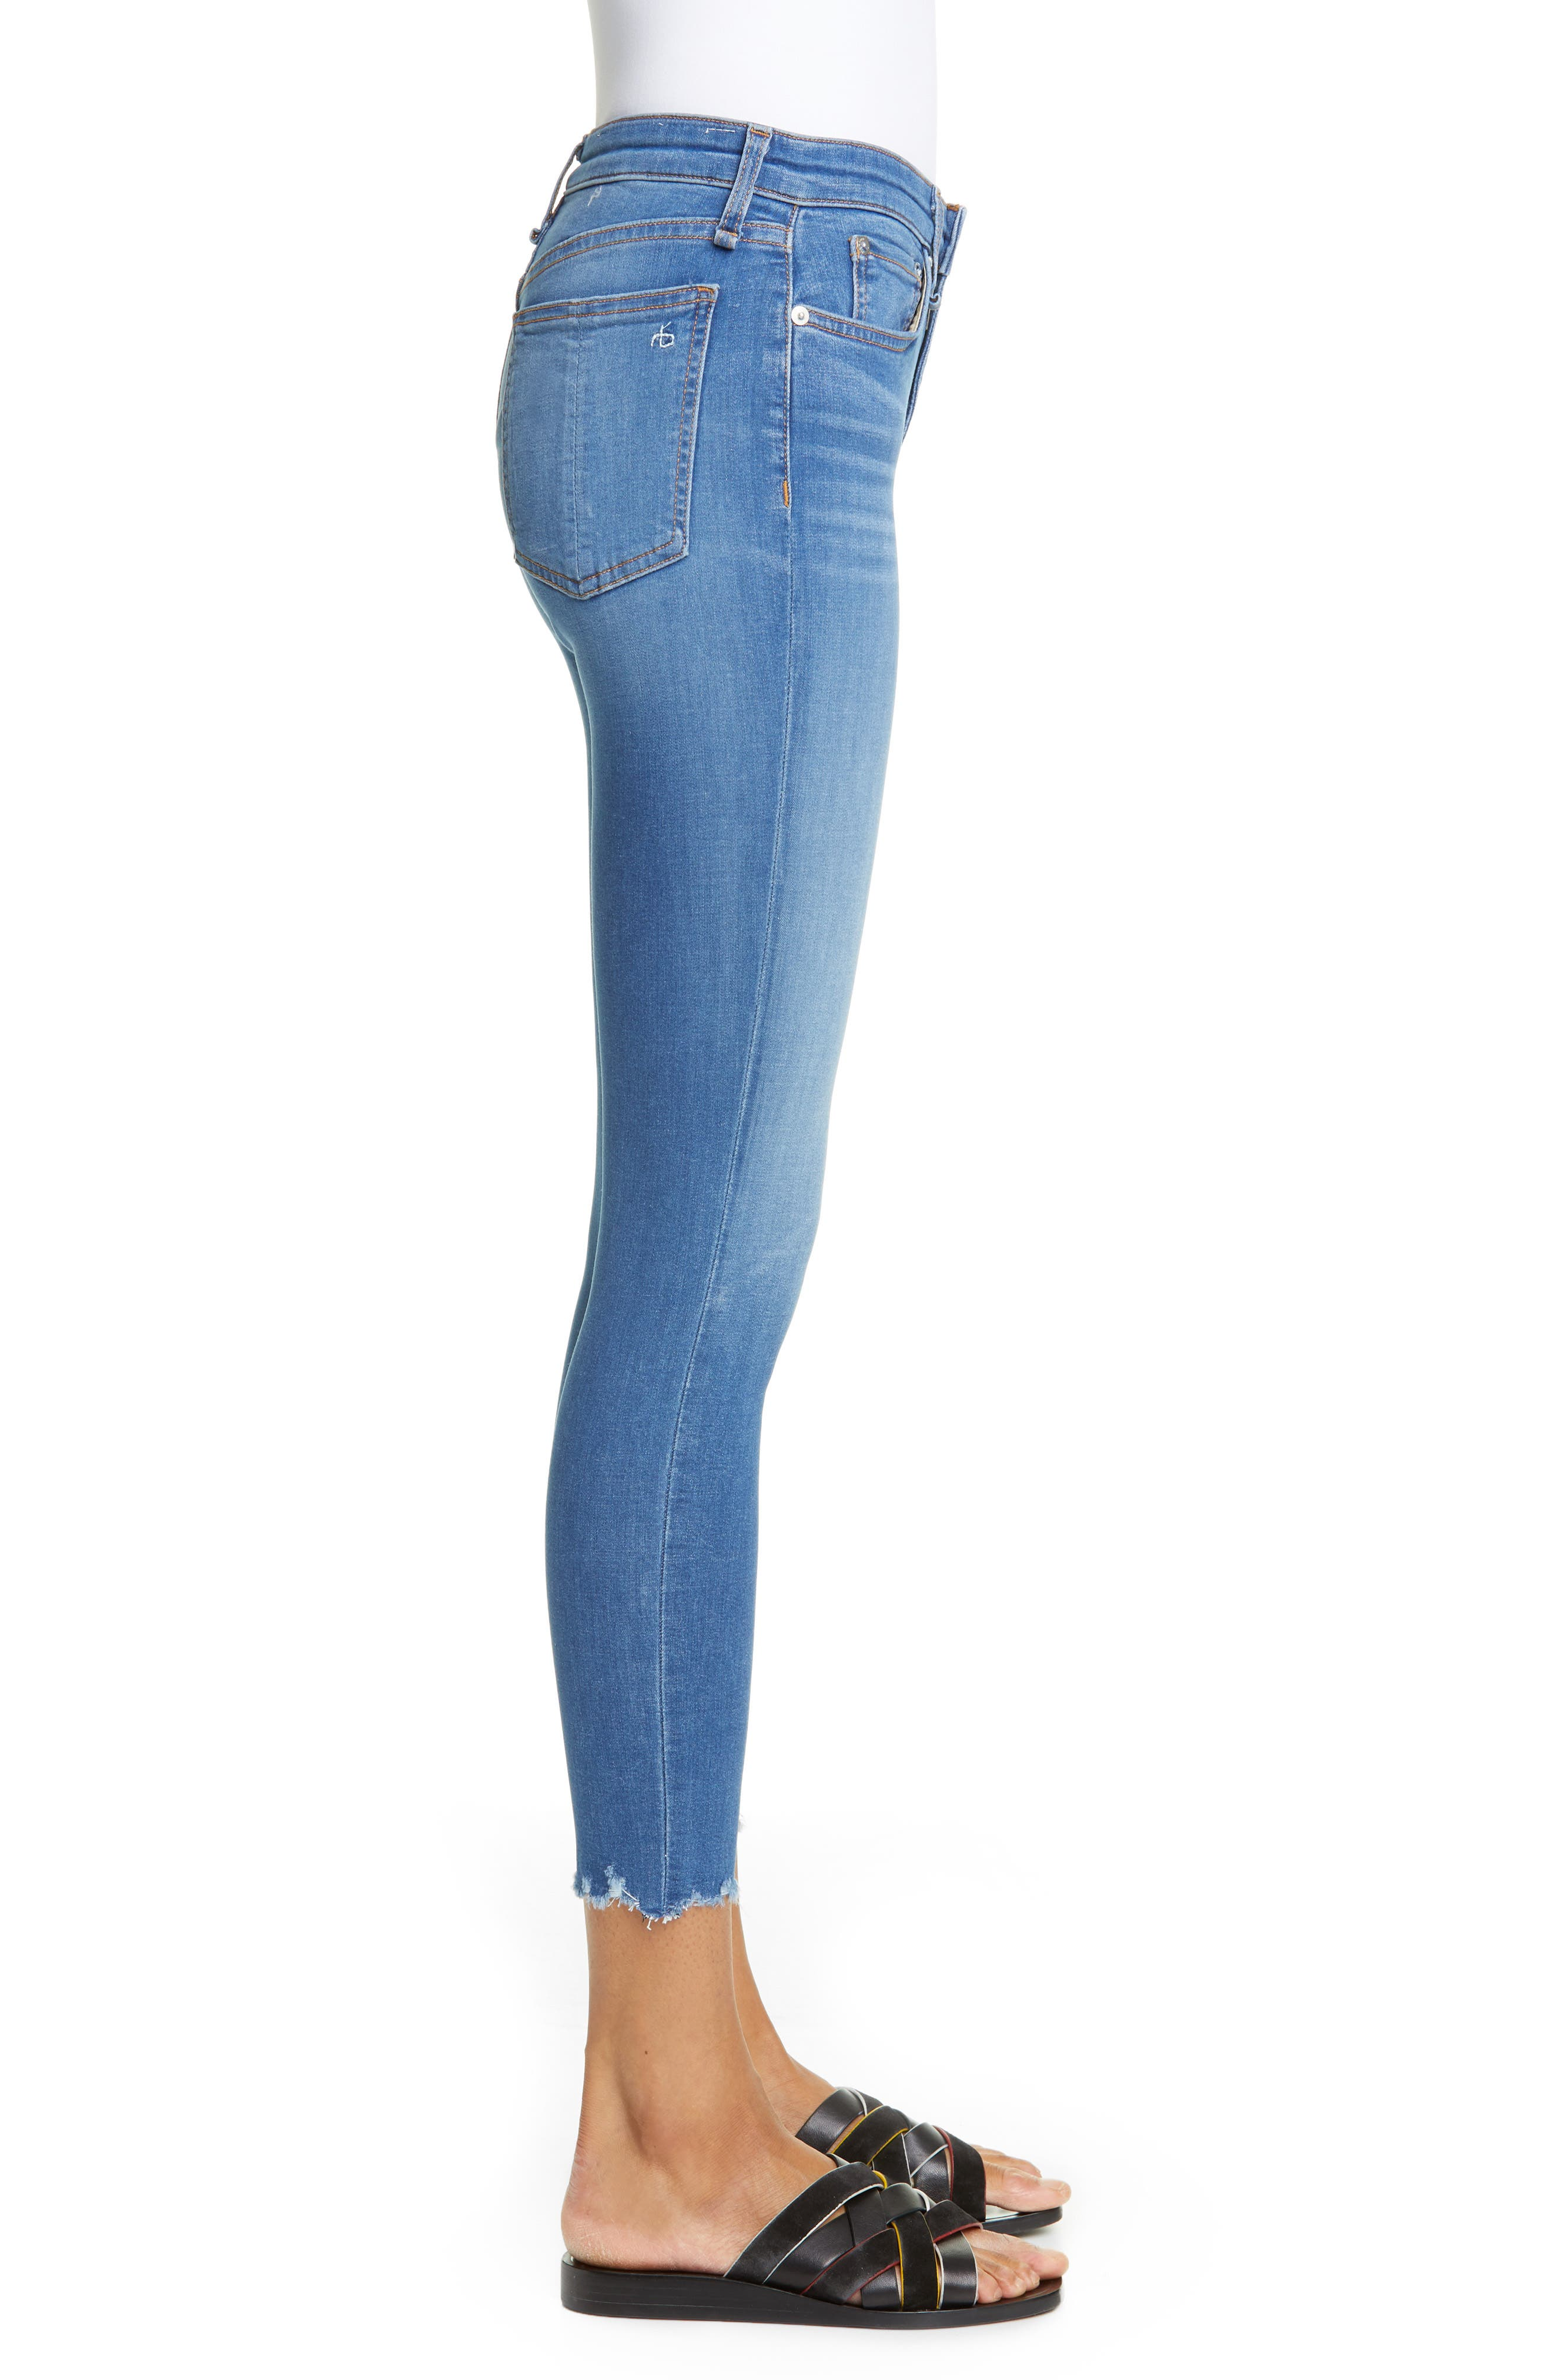 RAG & BONE, Cate High Waist Ankle Skinny Jeans, Alternate thumbnail 4, color, FLINT